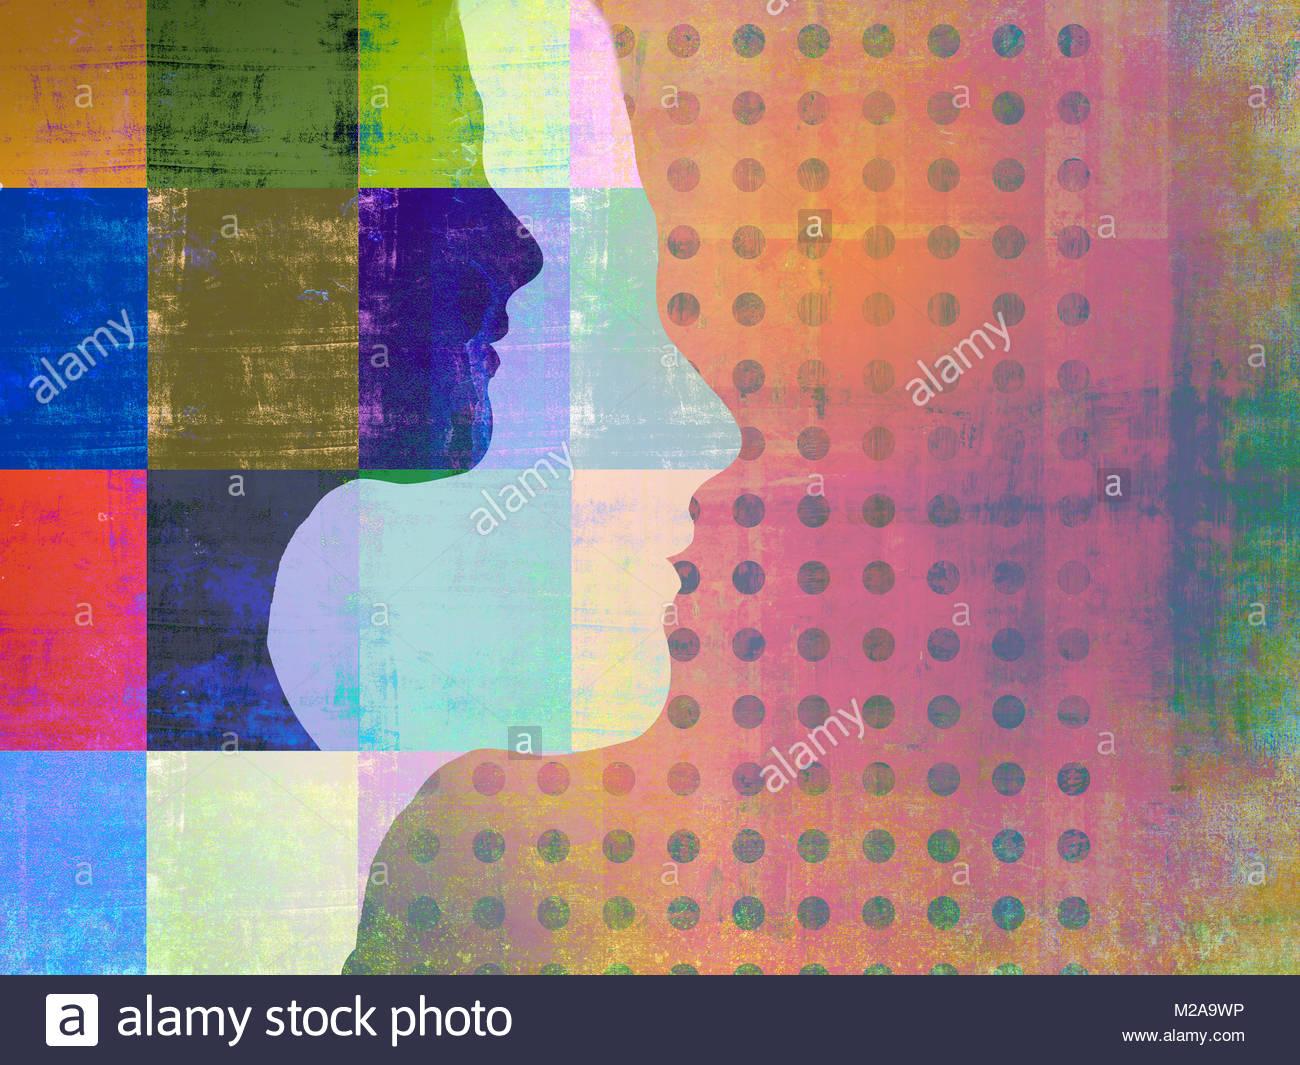 Woman's Profile auf abstrakte Muster überlagert Stockbild